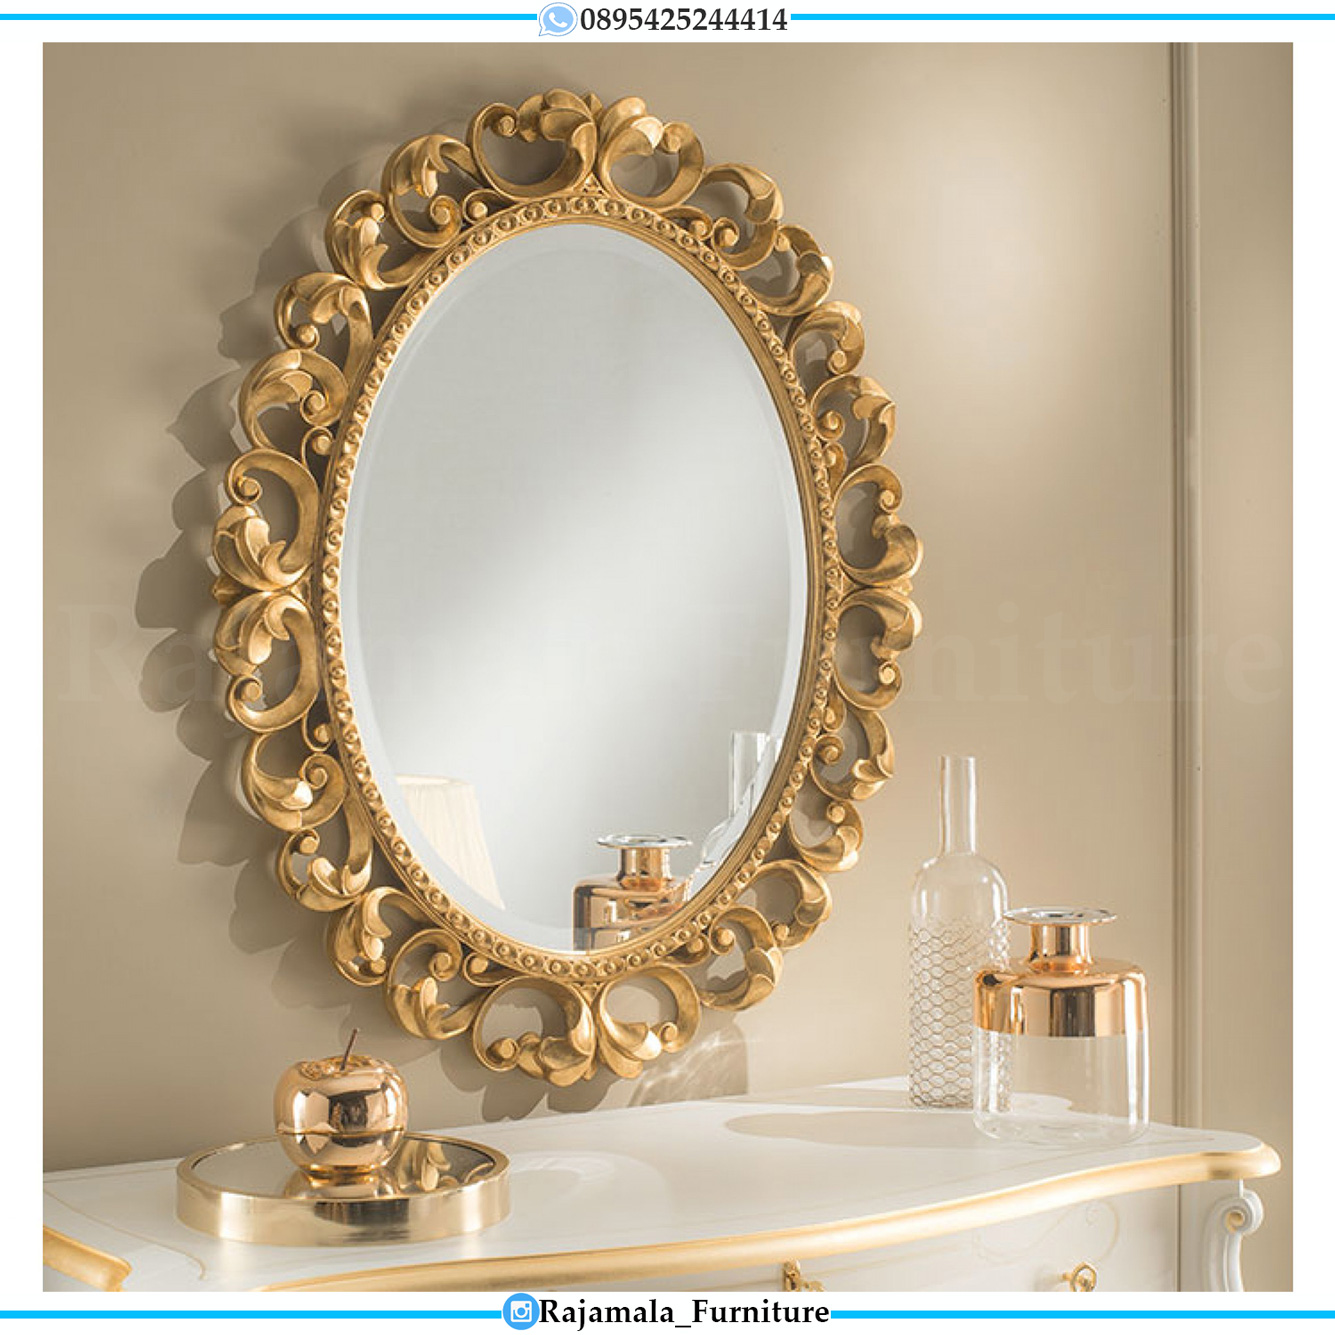 Harga Cermin Hias Mewah Oval Ukiran Jepara Premiere Palace Style RM-0503